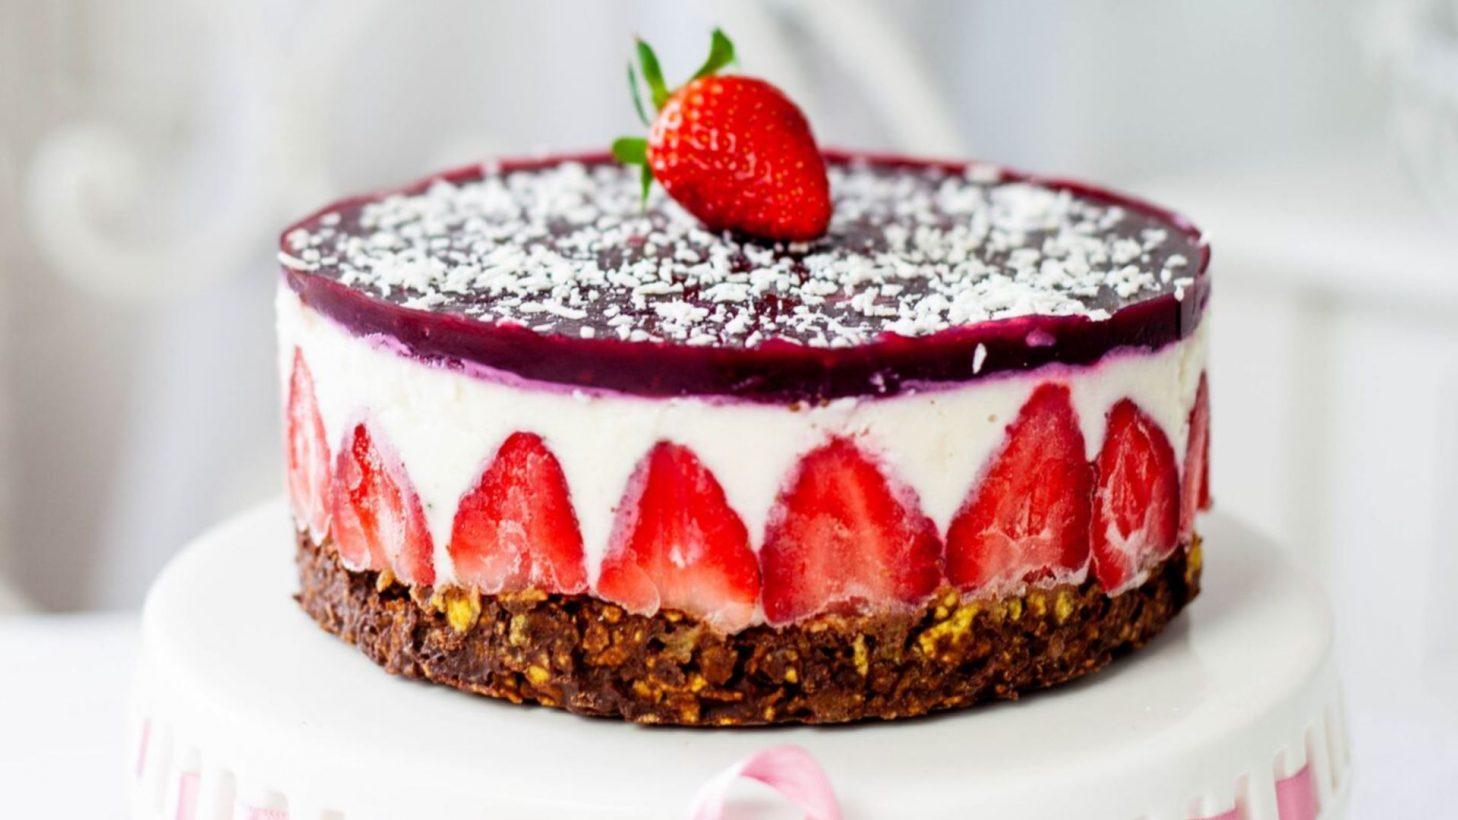 Kokos-Erdbeer-Torte mit Schokoladen-Cornflakesboden